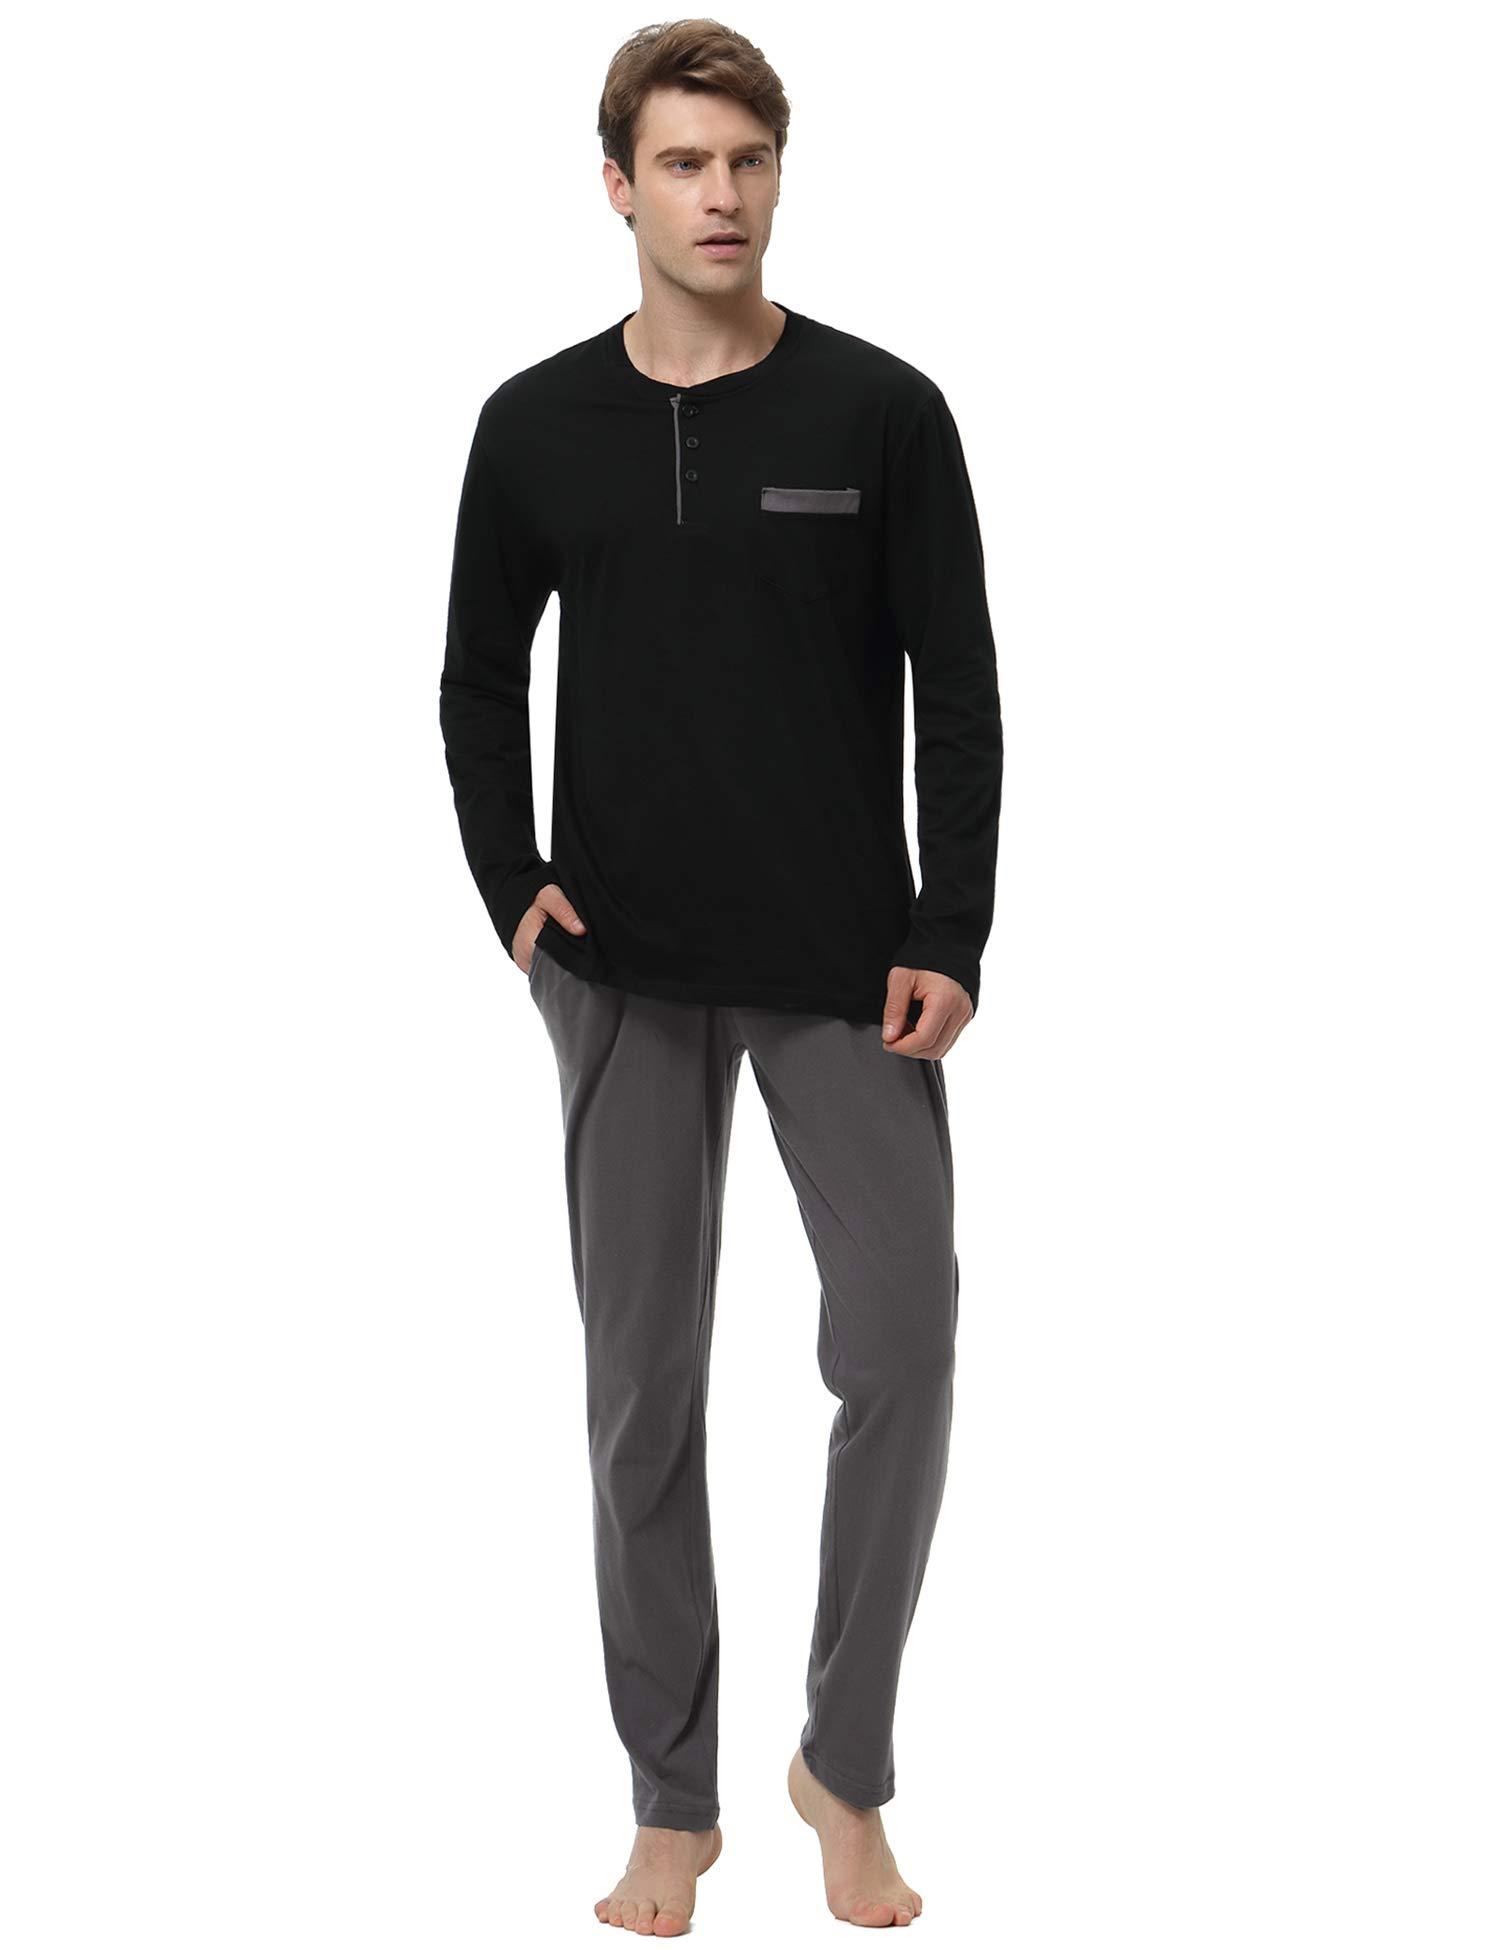 Hawiton Men's Long Sleeve Pajama Pants Set Cotton Sleep Top & Bottoms